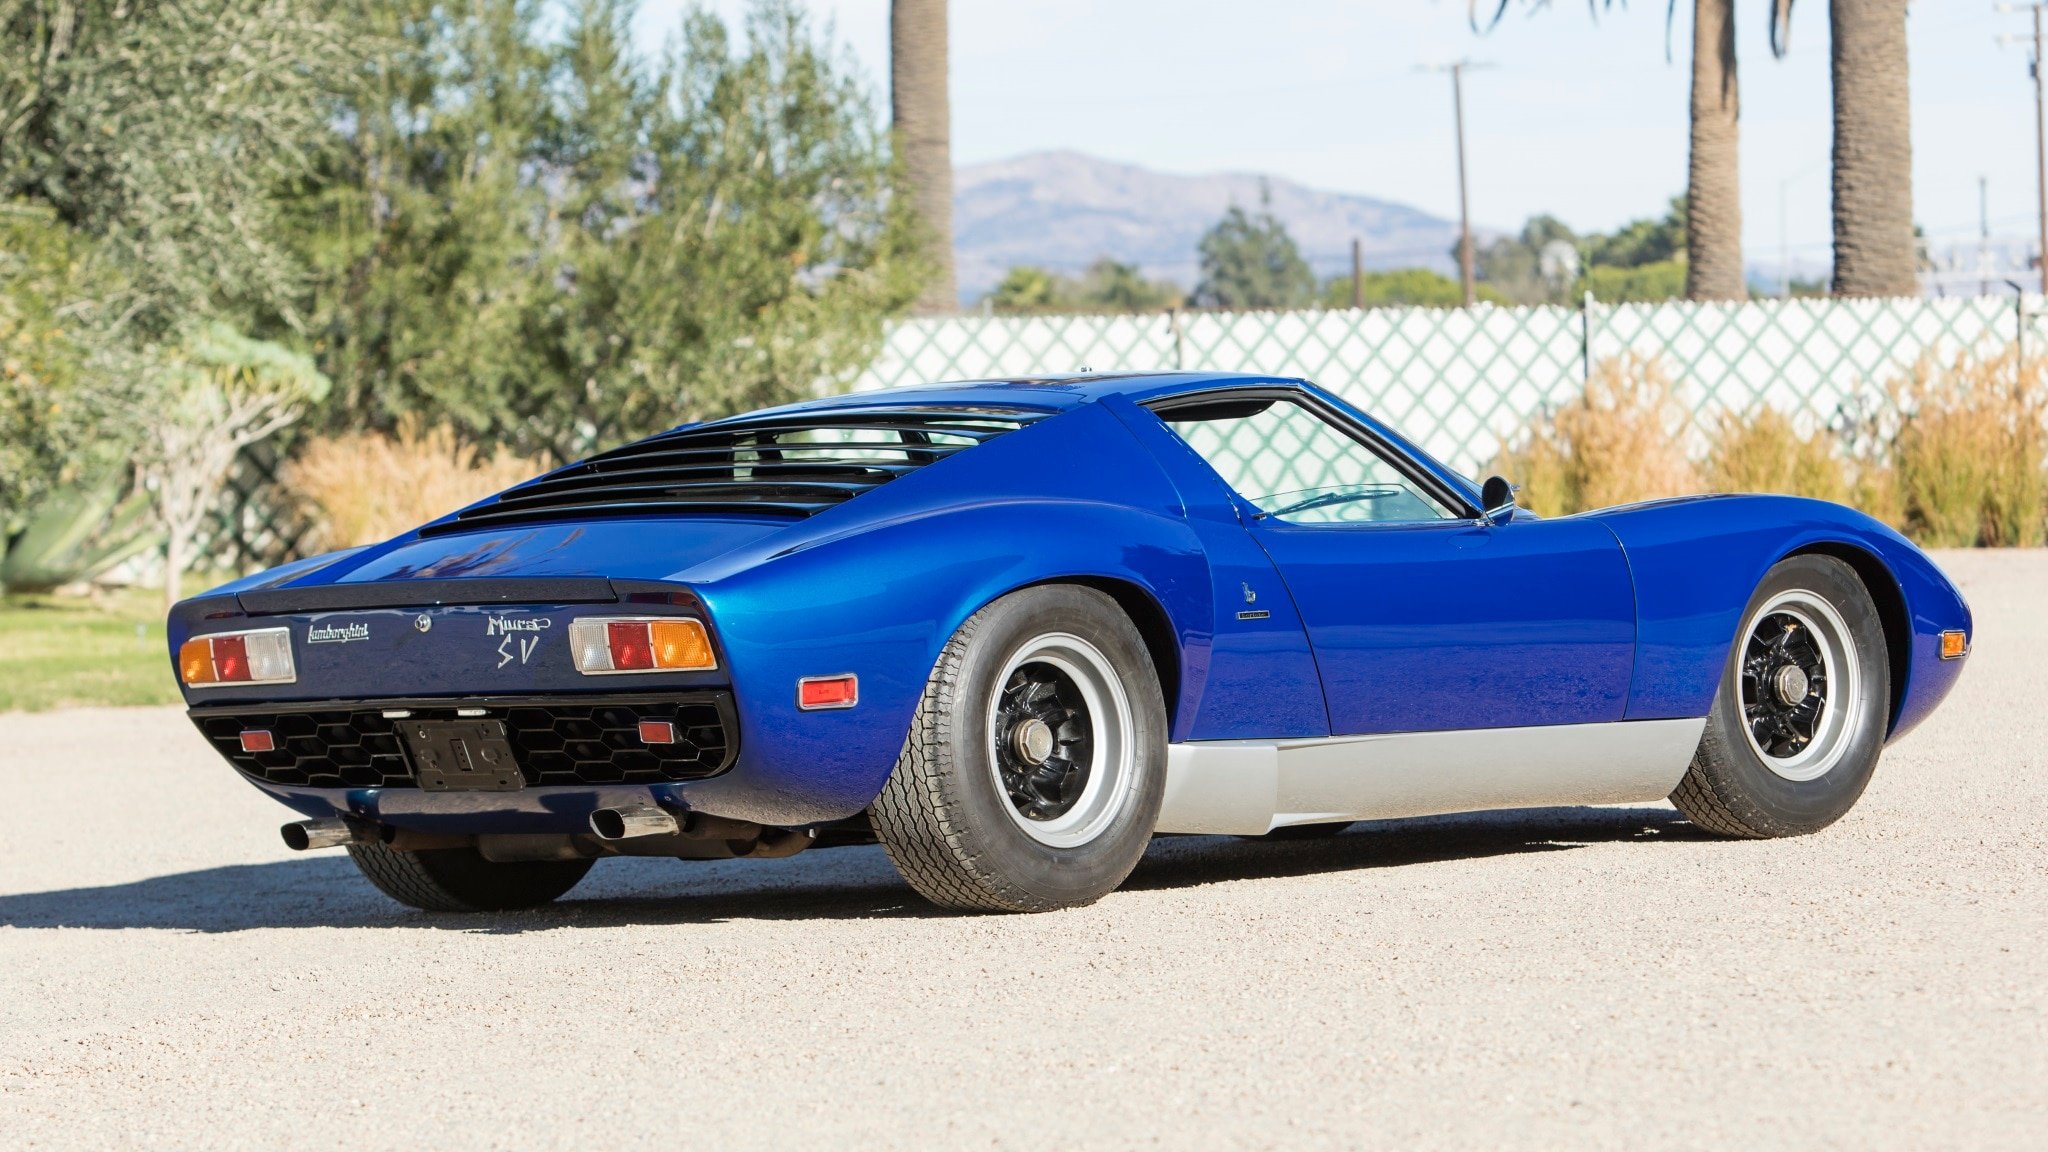 Lamborghini Miura Sv And Porsche 904 Gts Headline Bonhams Auction